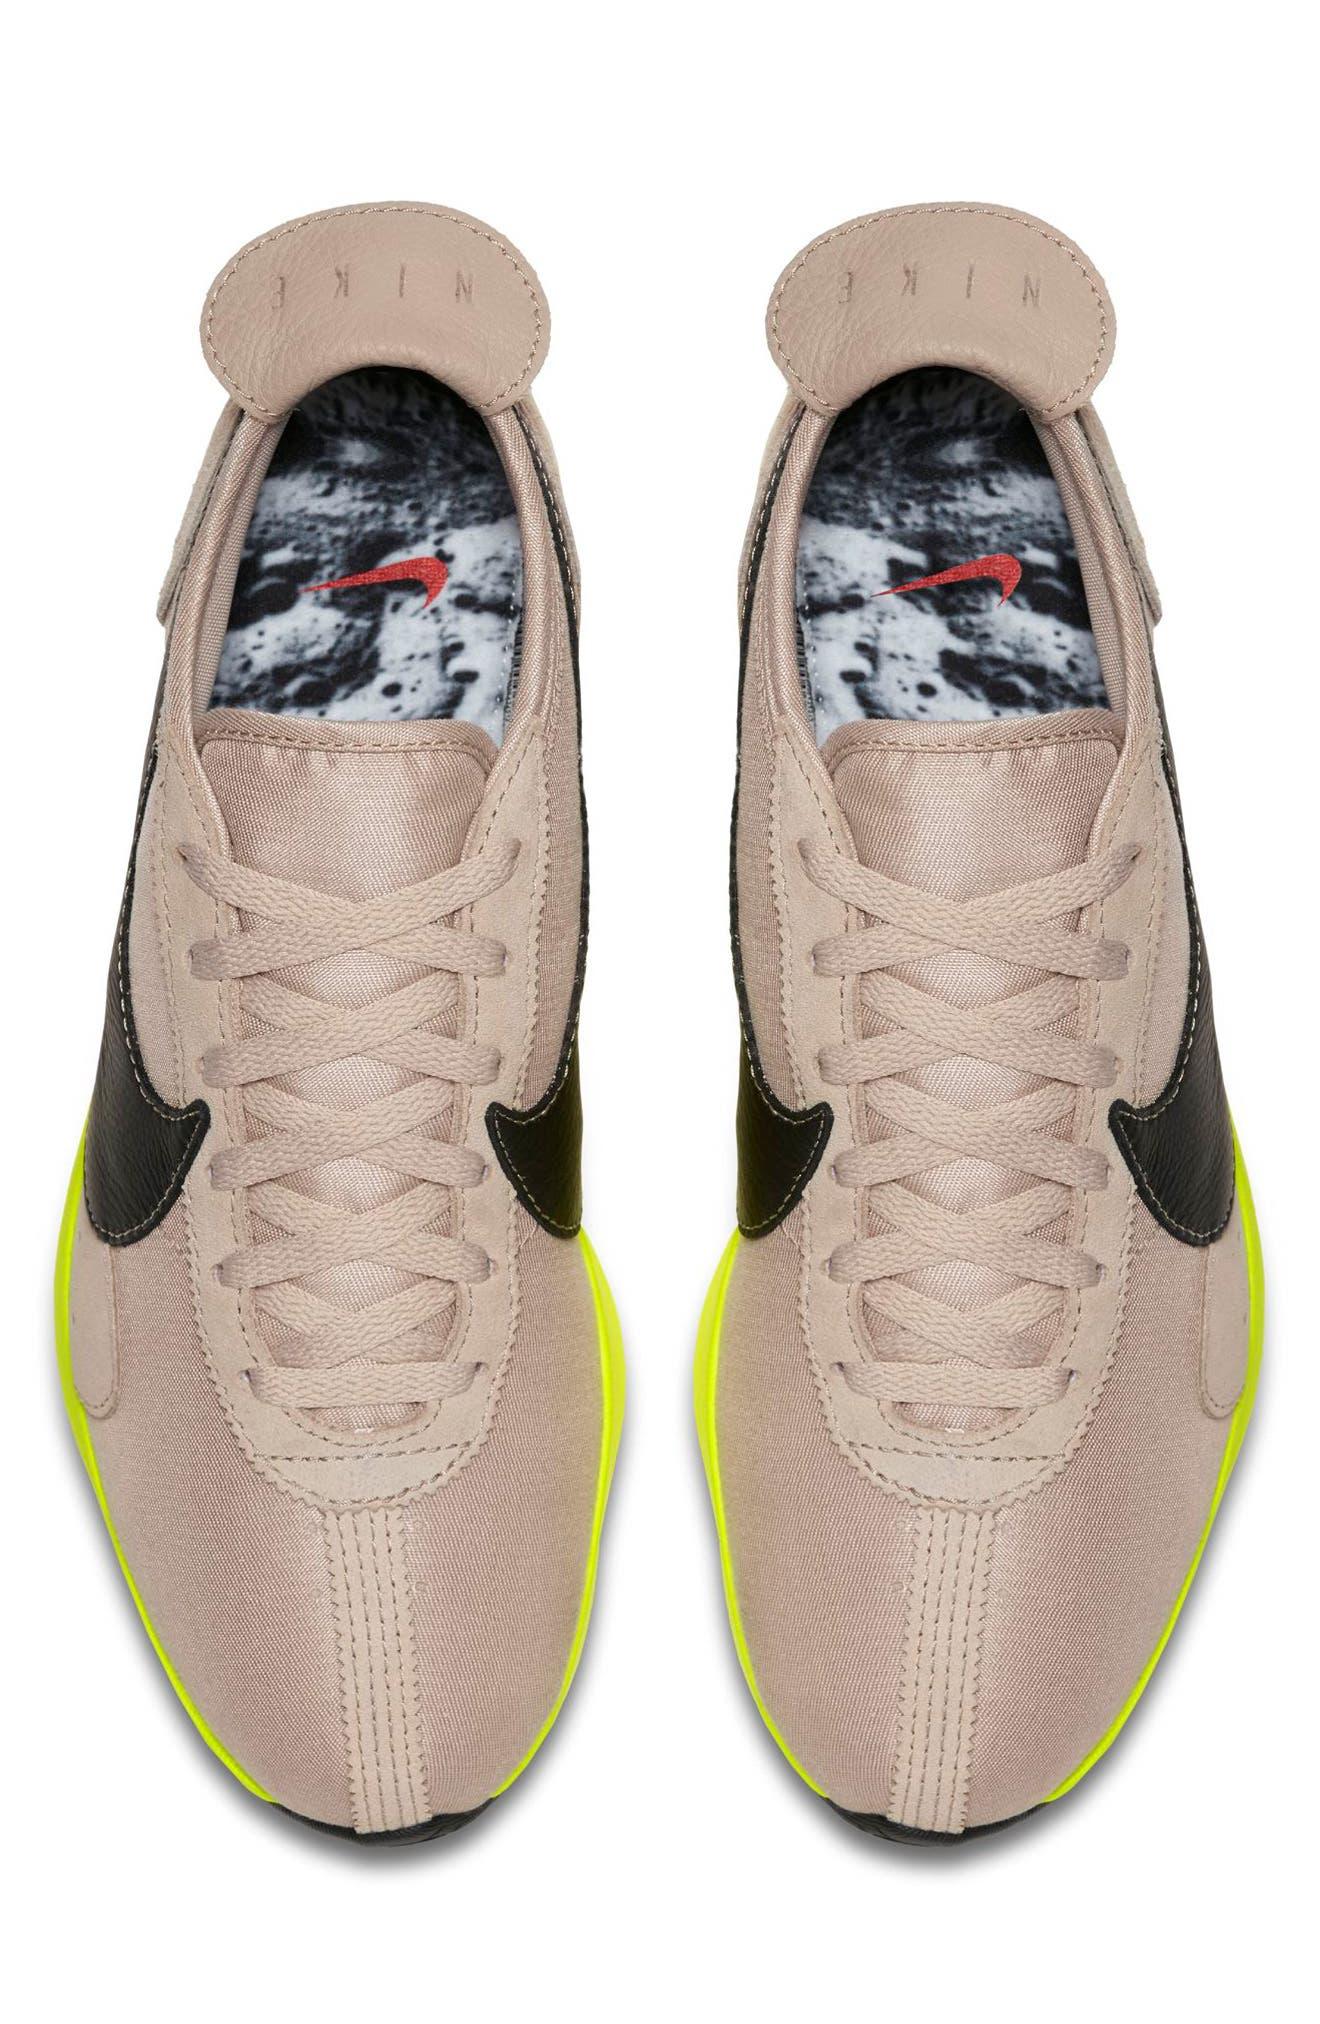 Moon Racer Sneaker,                             Alternate thumbnail 4, color,                             STRING/ BLACK/ SAIL/ VOLT